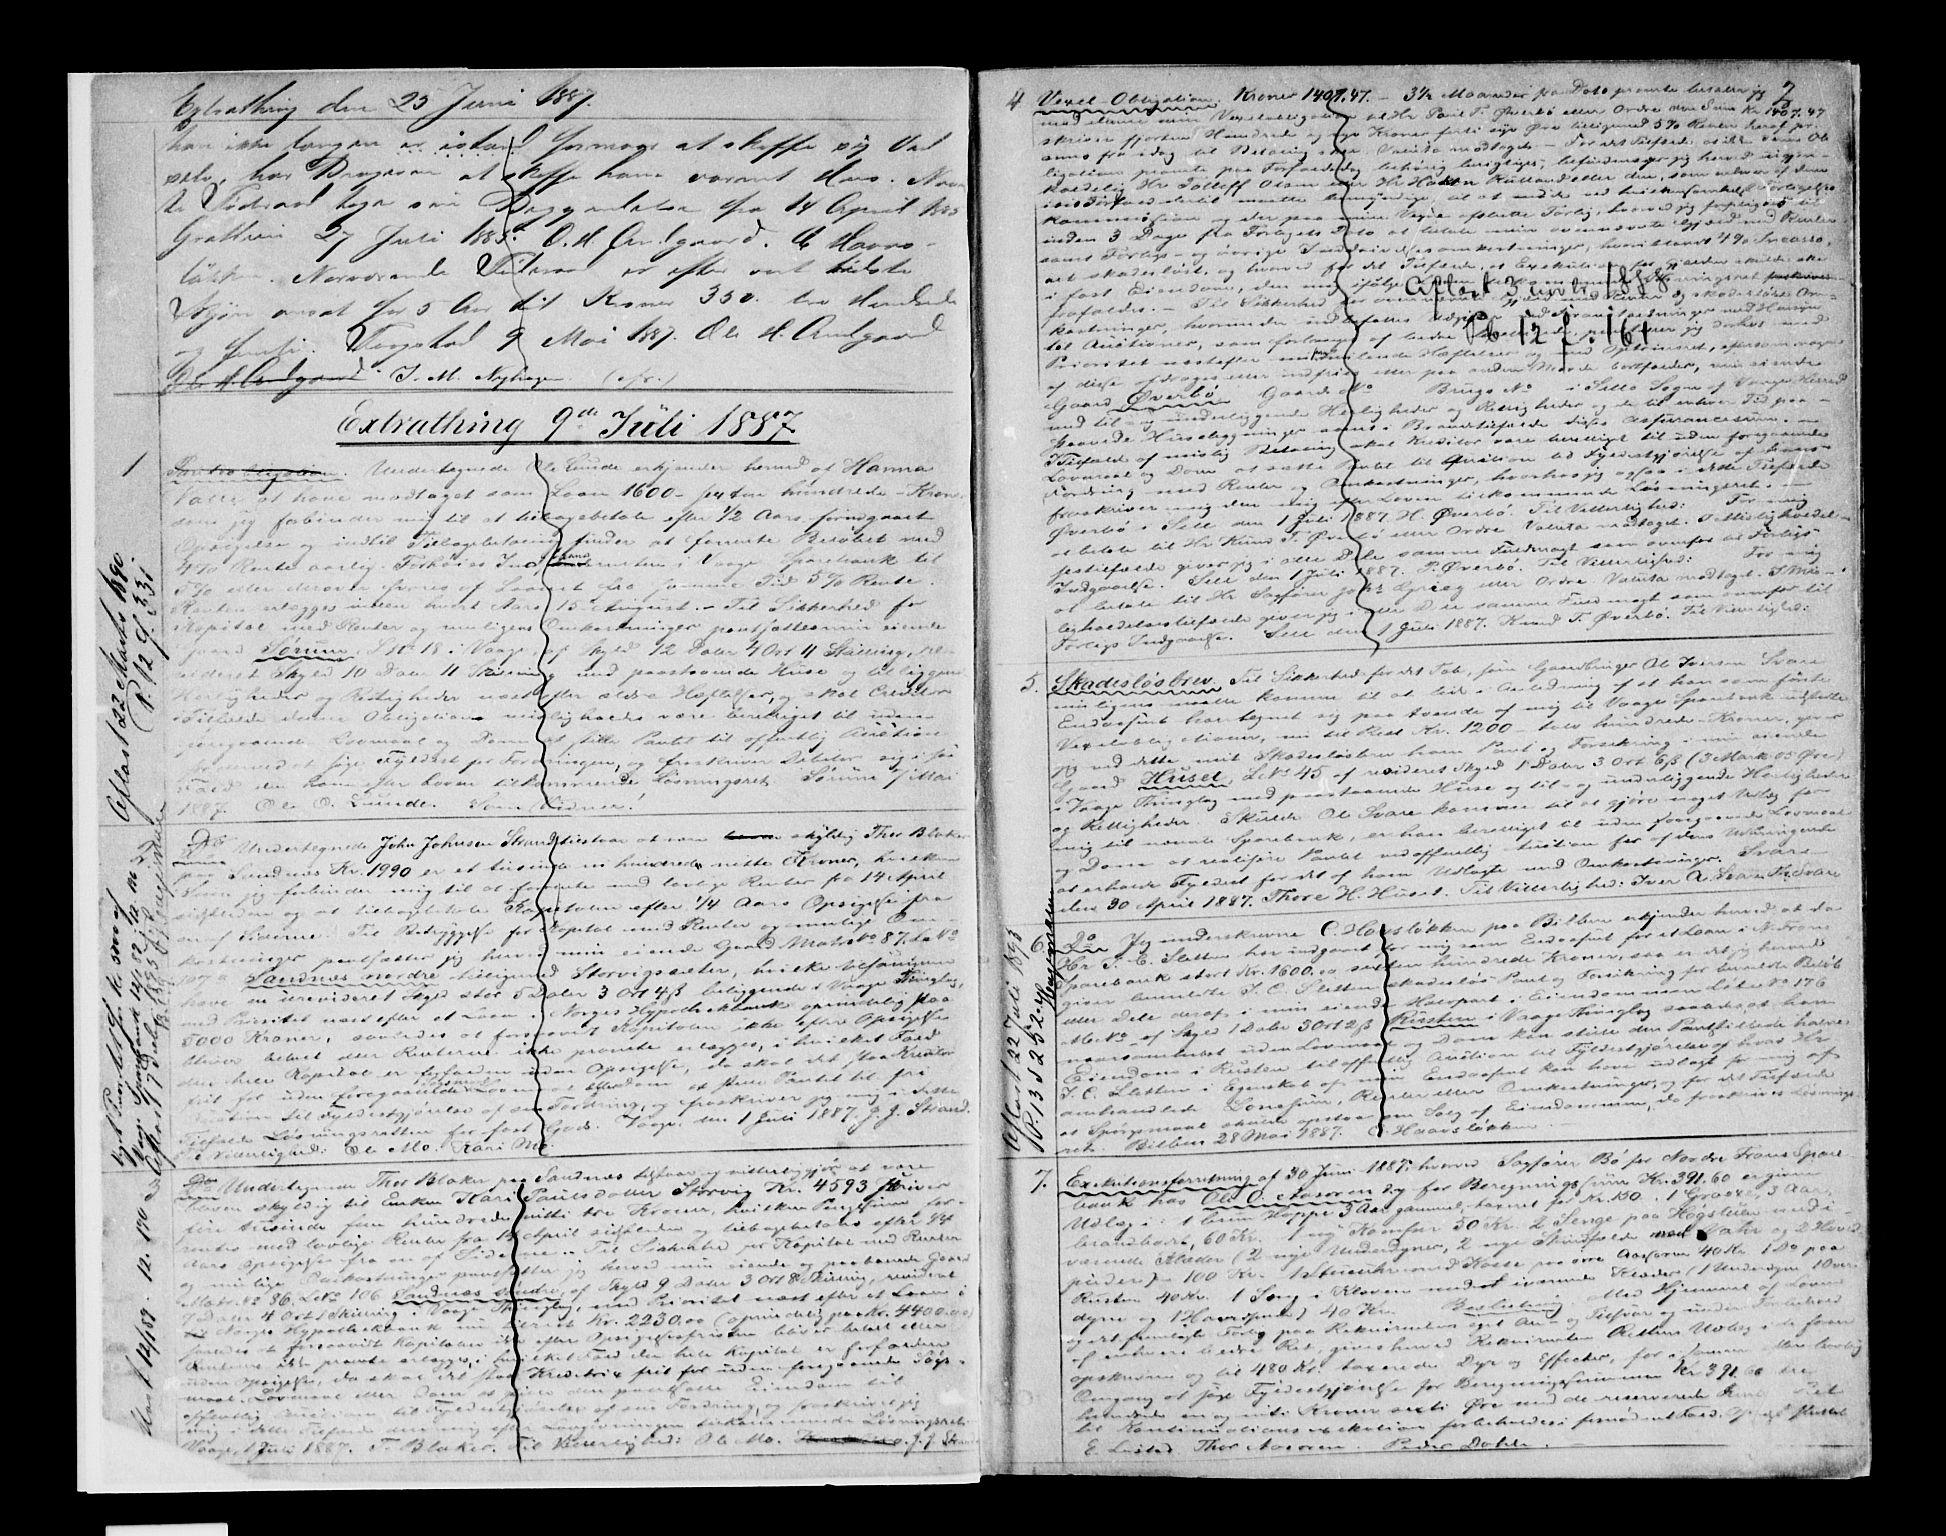 SAH, Nord-Gudbrandsdal tingrett, H/Hb/Hba/L0012: Mortgage book no. 12, 1887-1892, p. 2